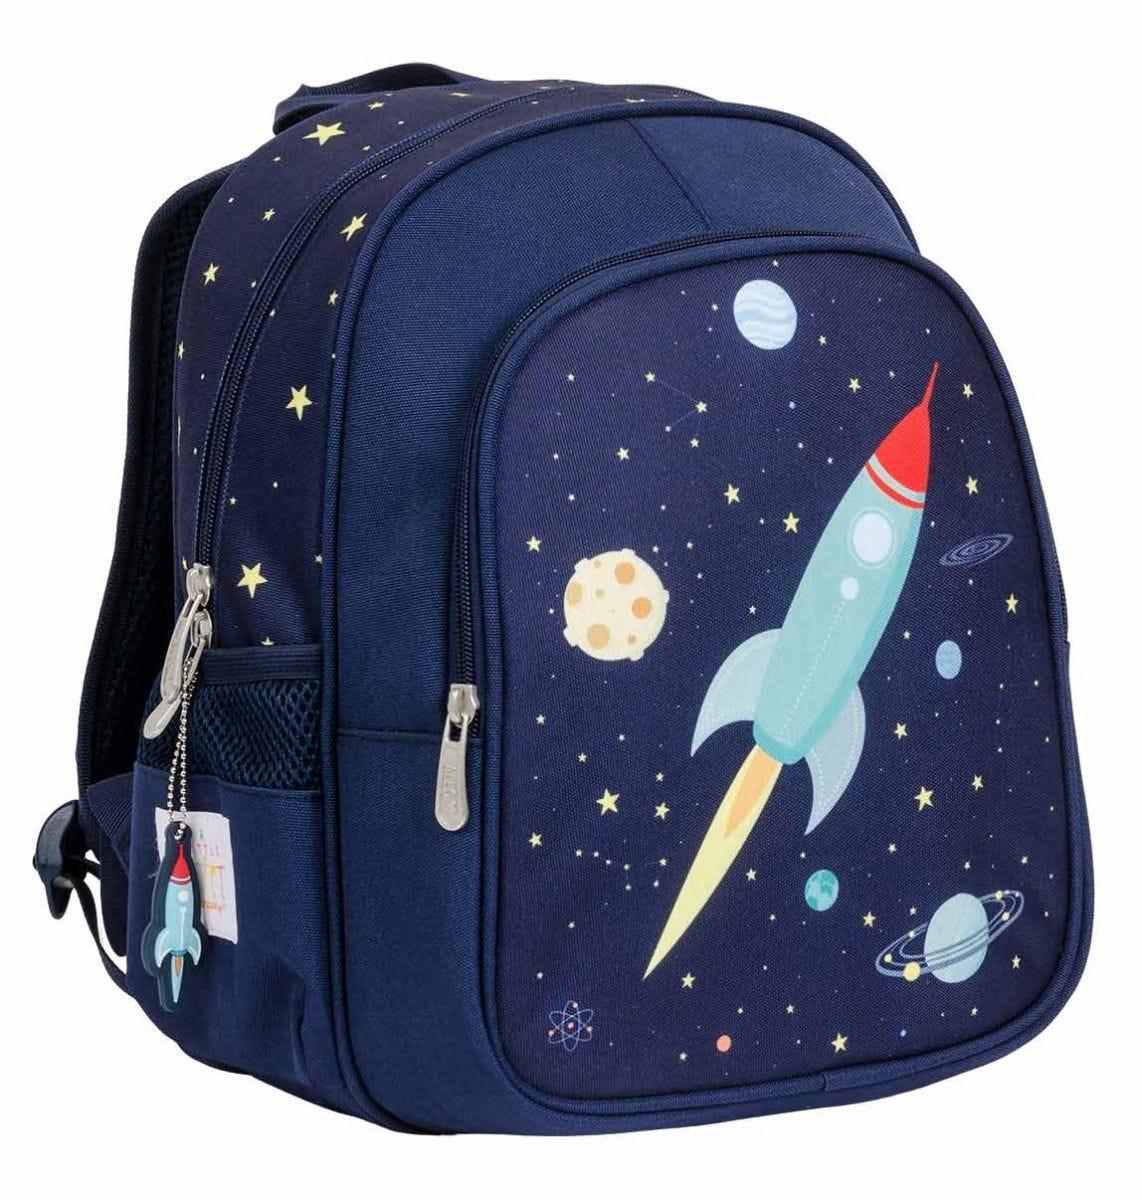 bpspbu40-lr-1_backpack_space